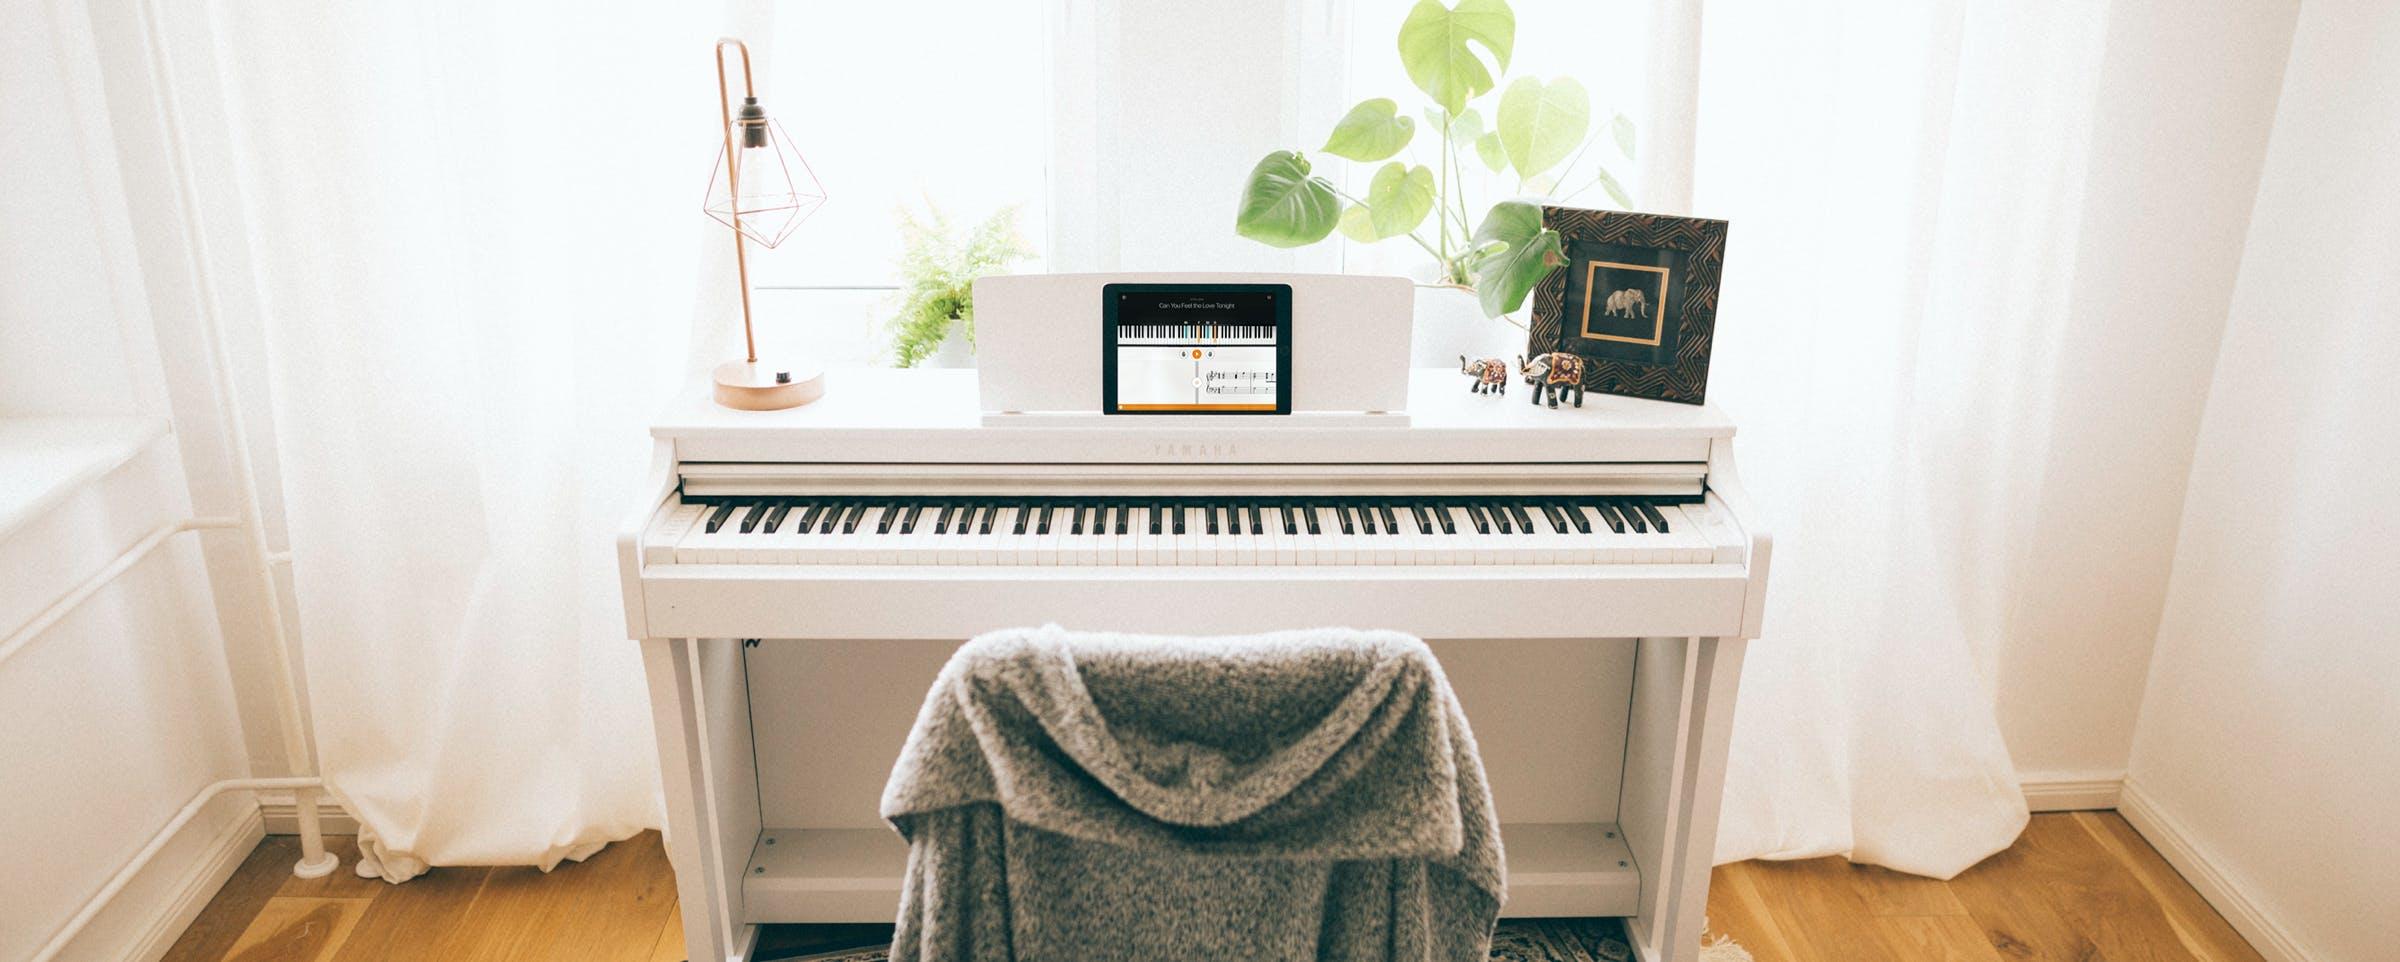 White Yamaha piano with an iPad